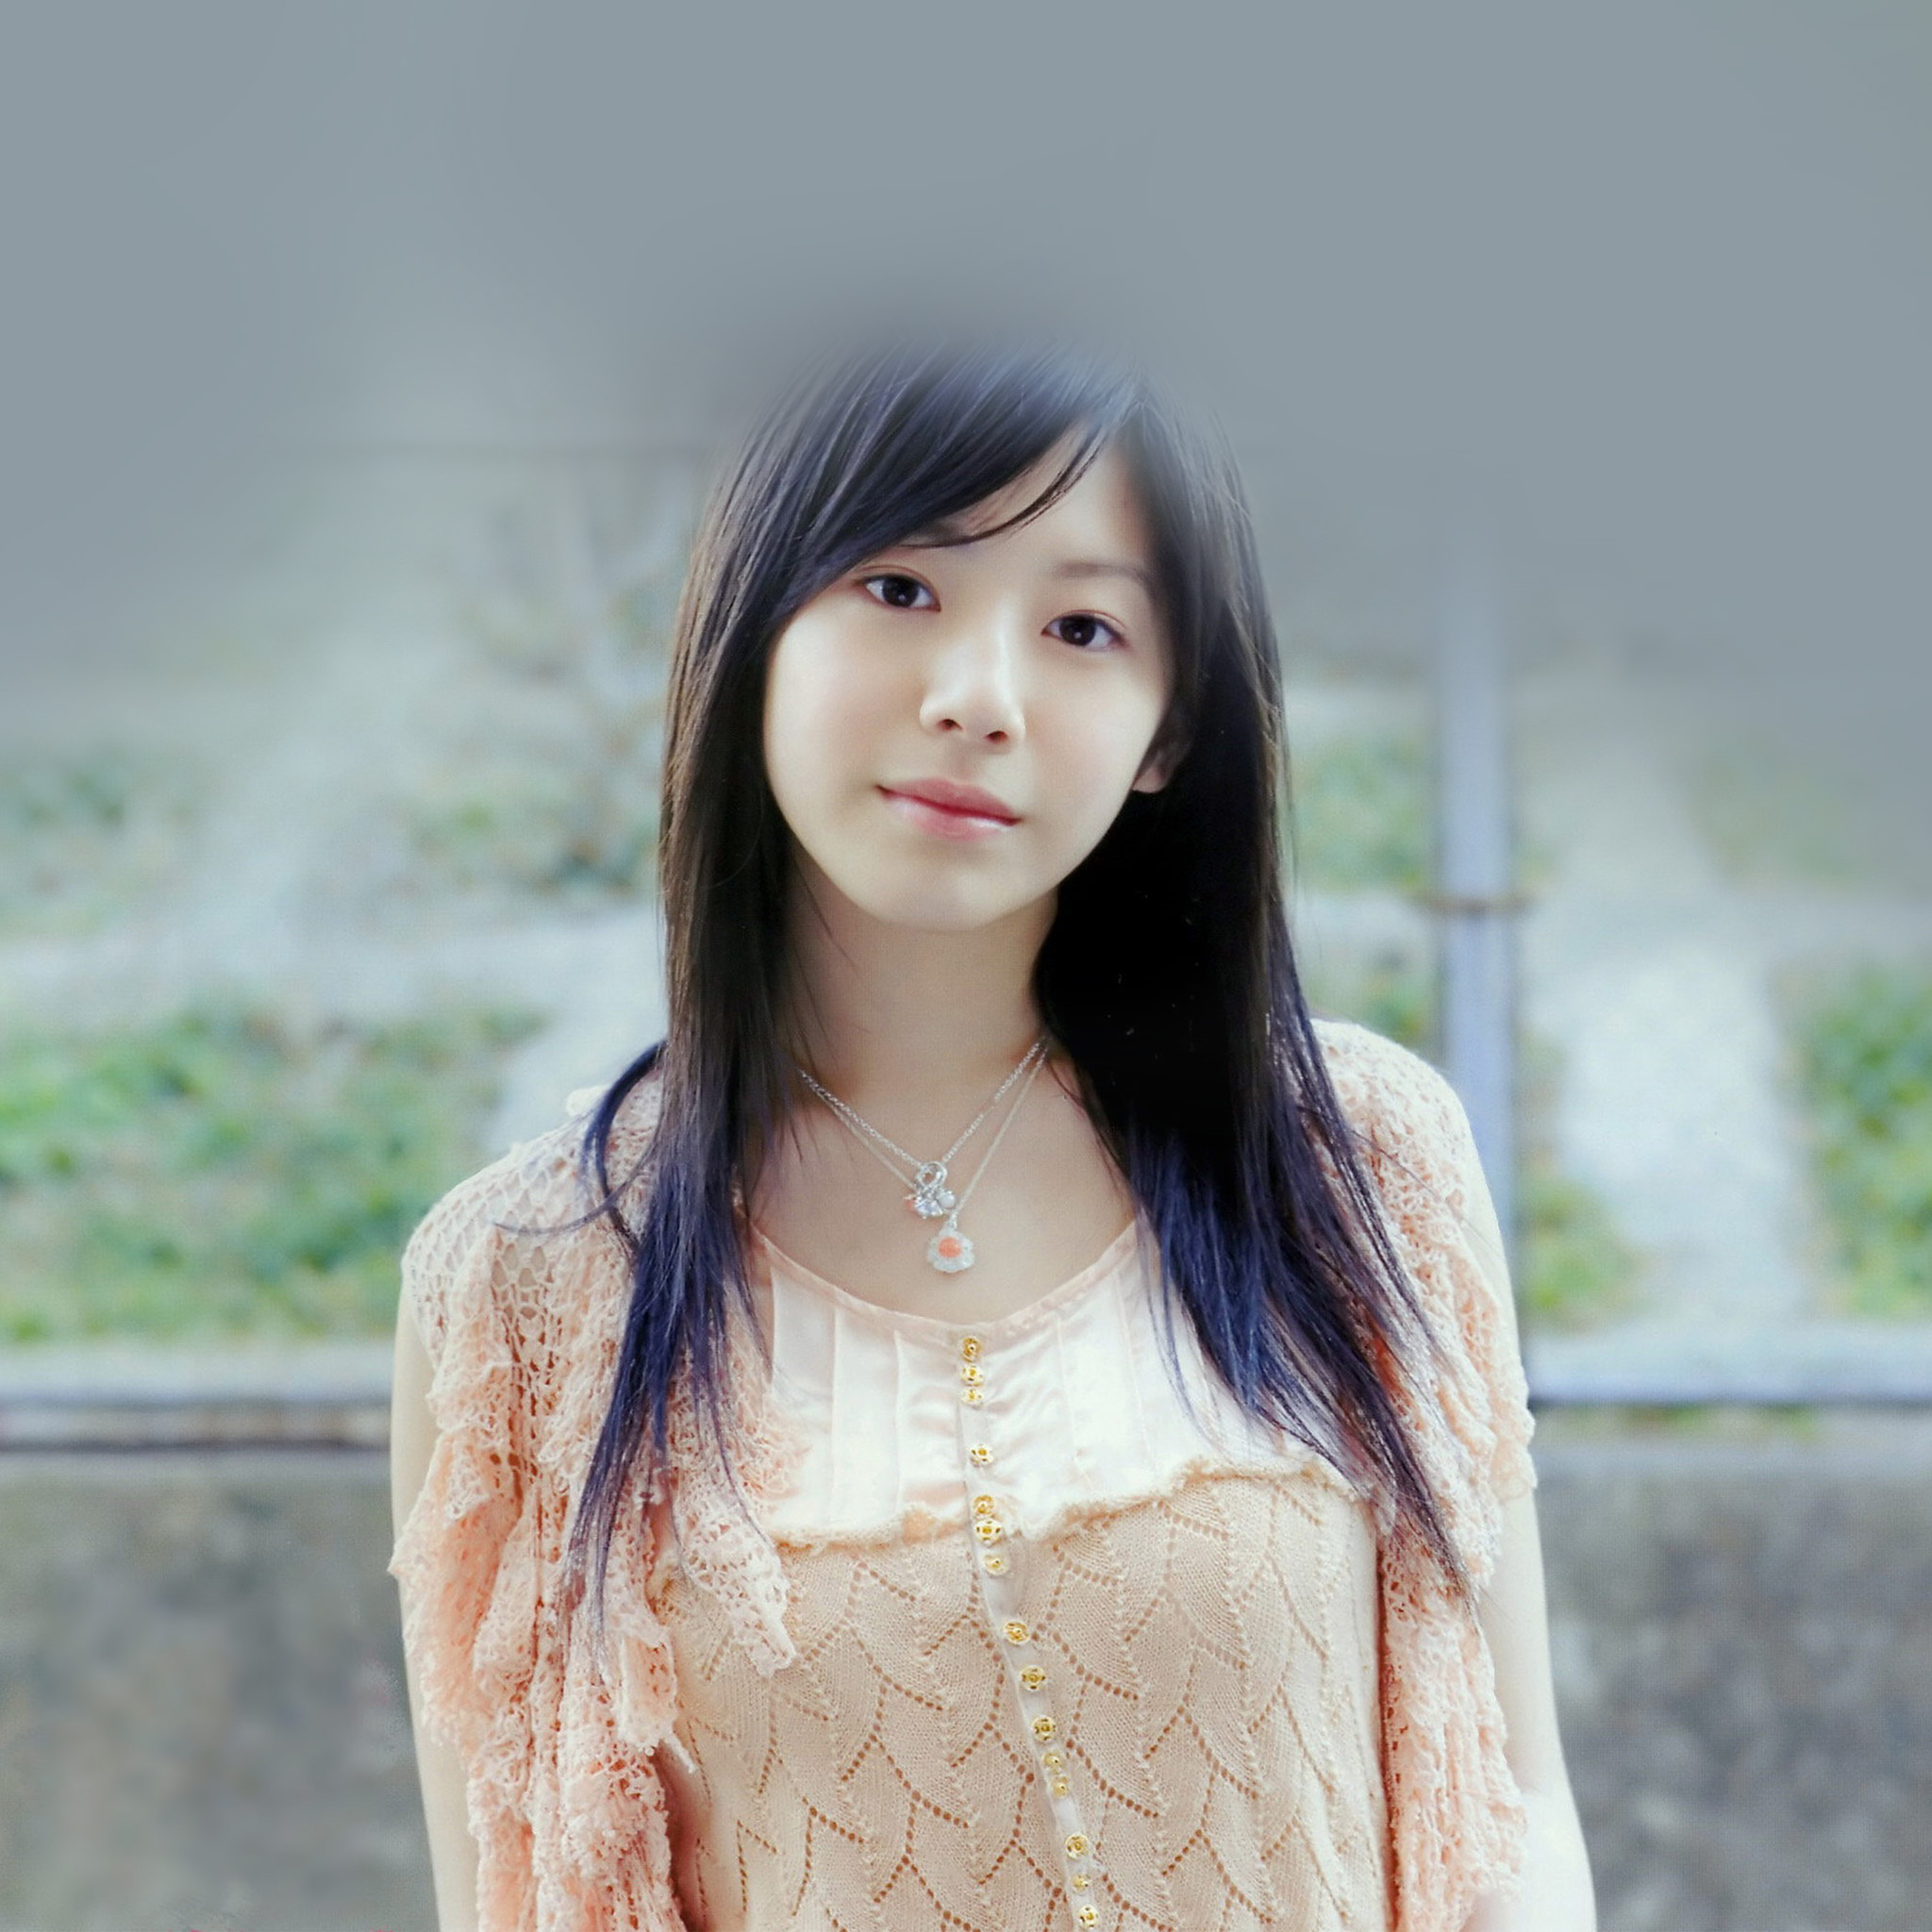 Hd Japan Movie8 Bath Com: IPad